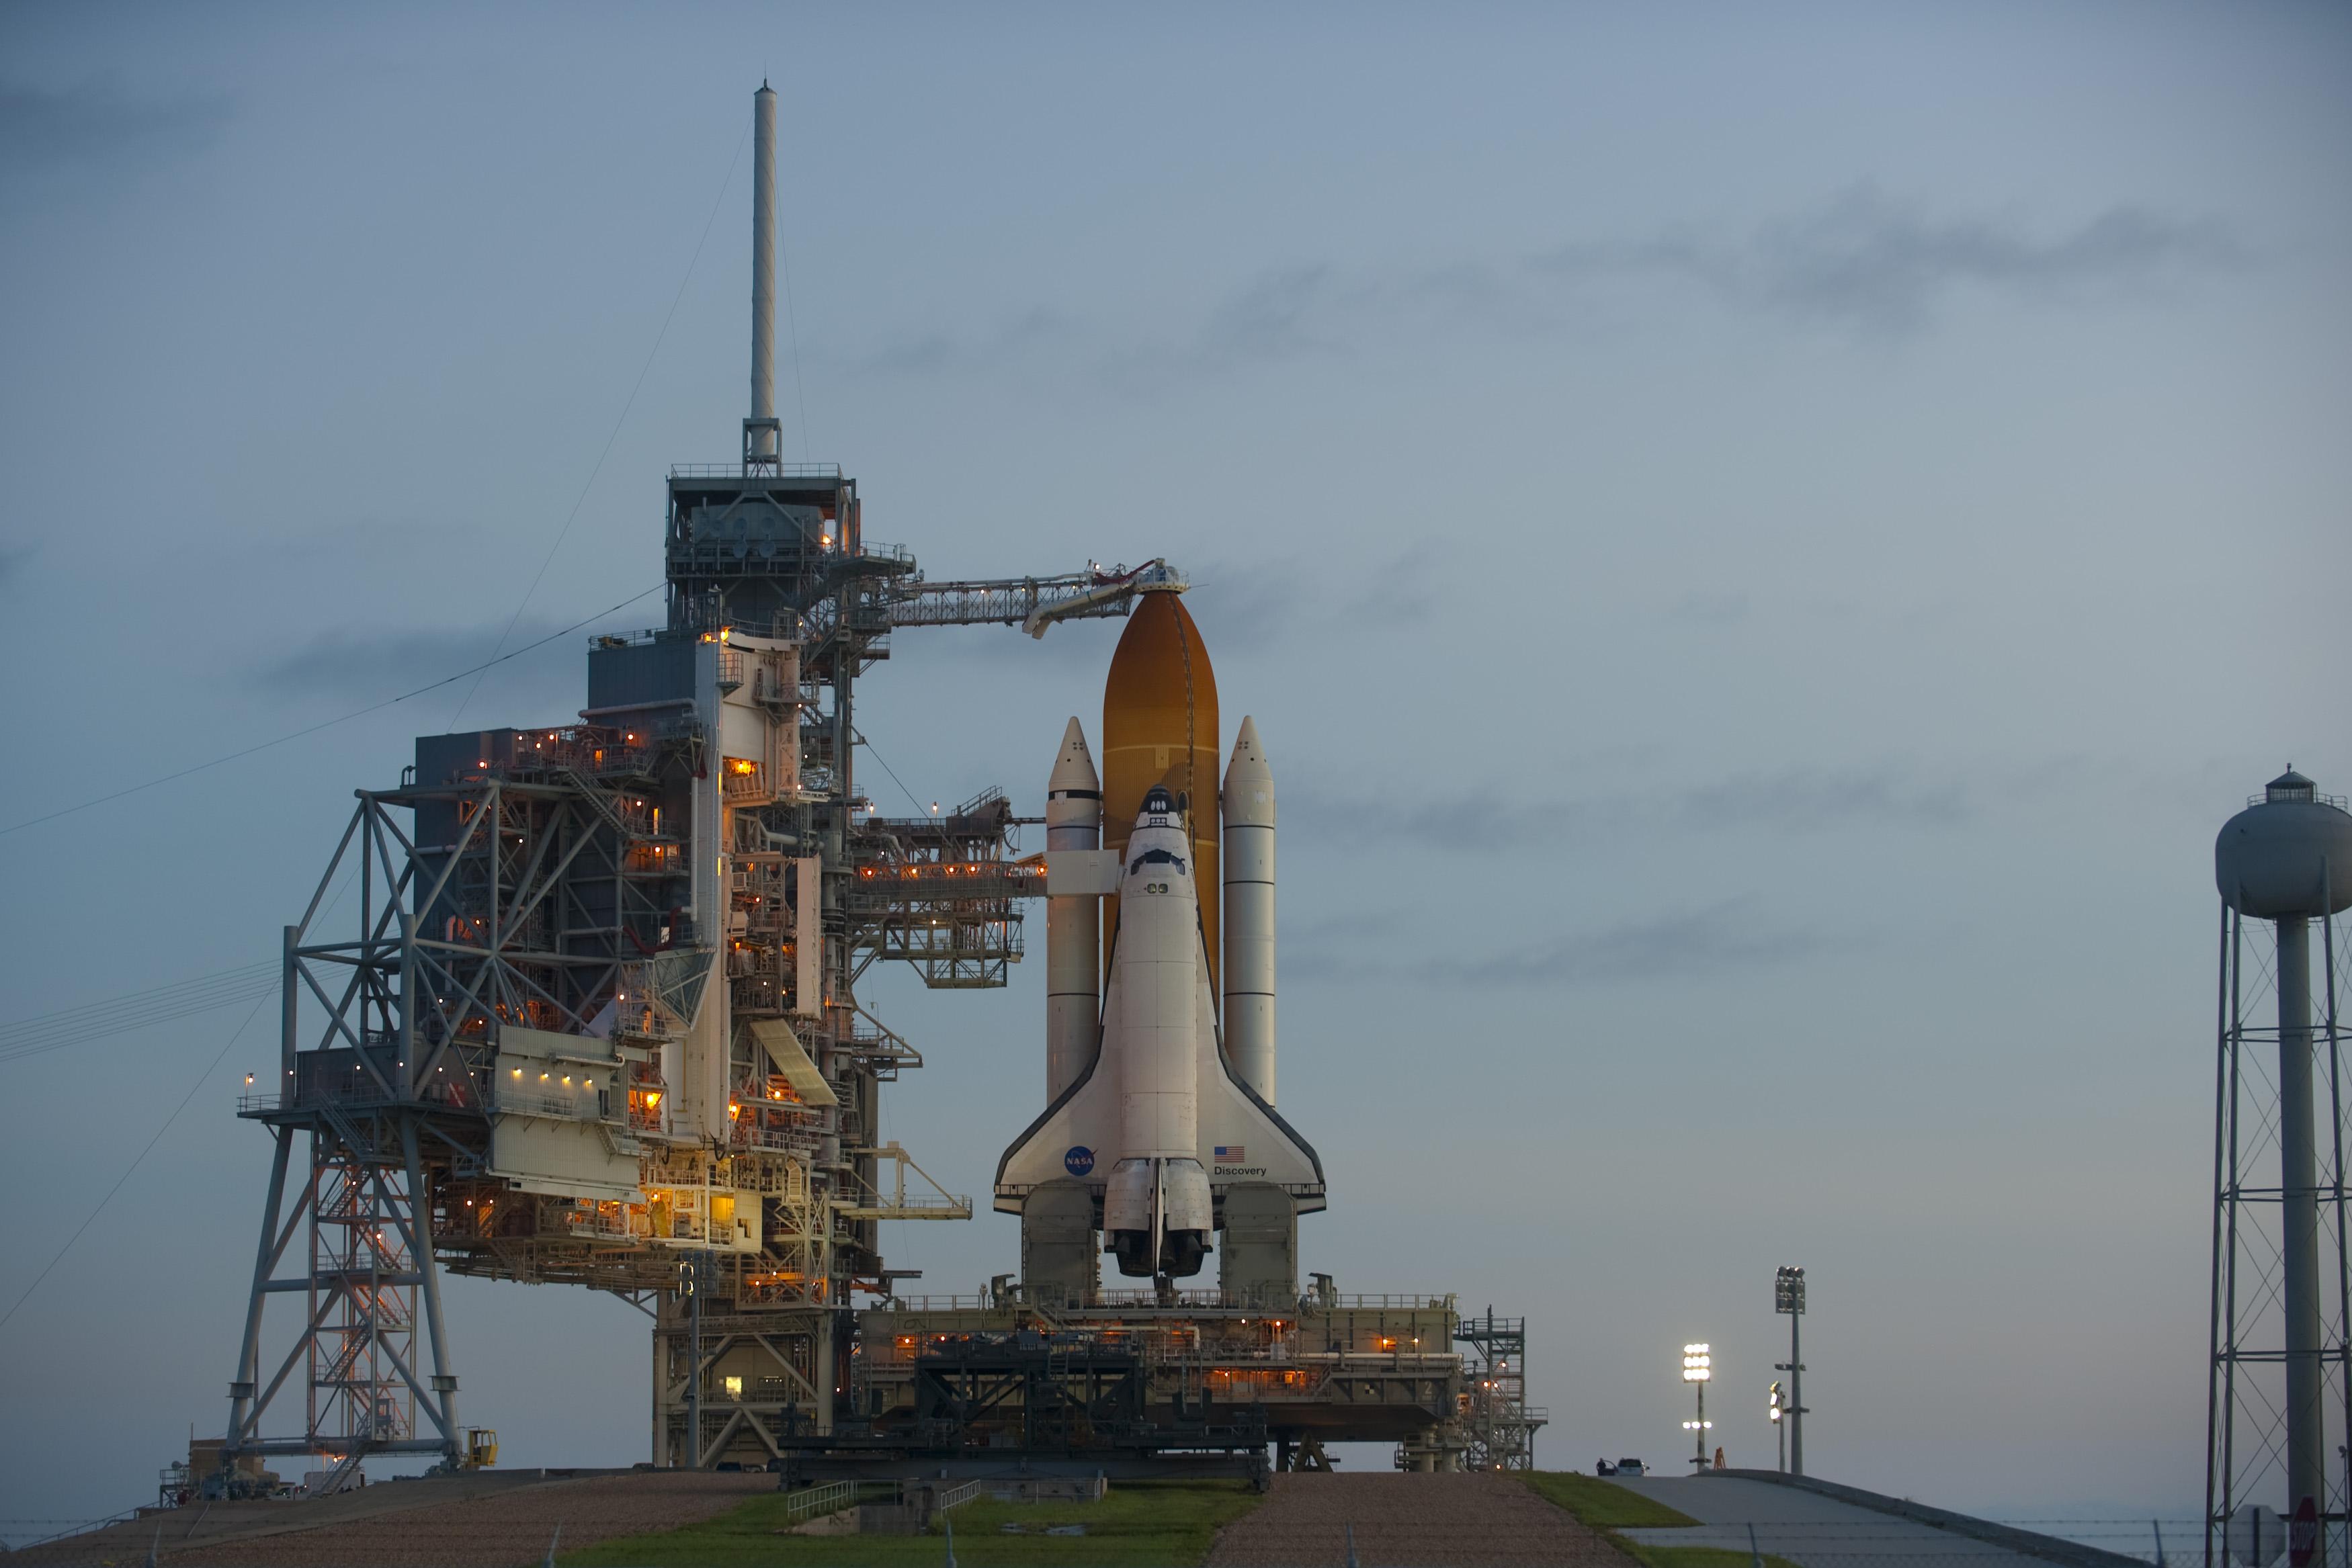 space shuttle landing pad - photo #24